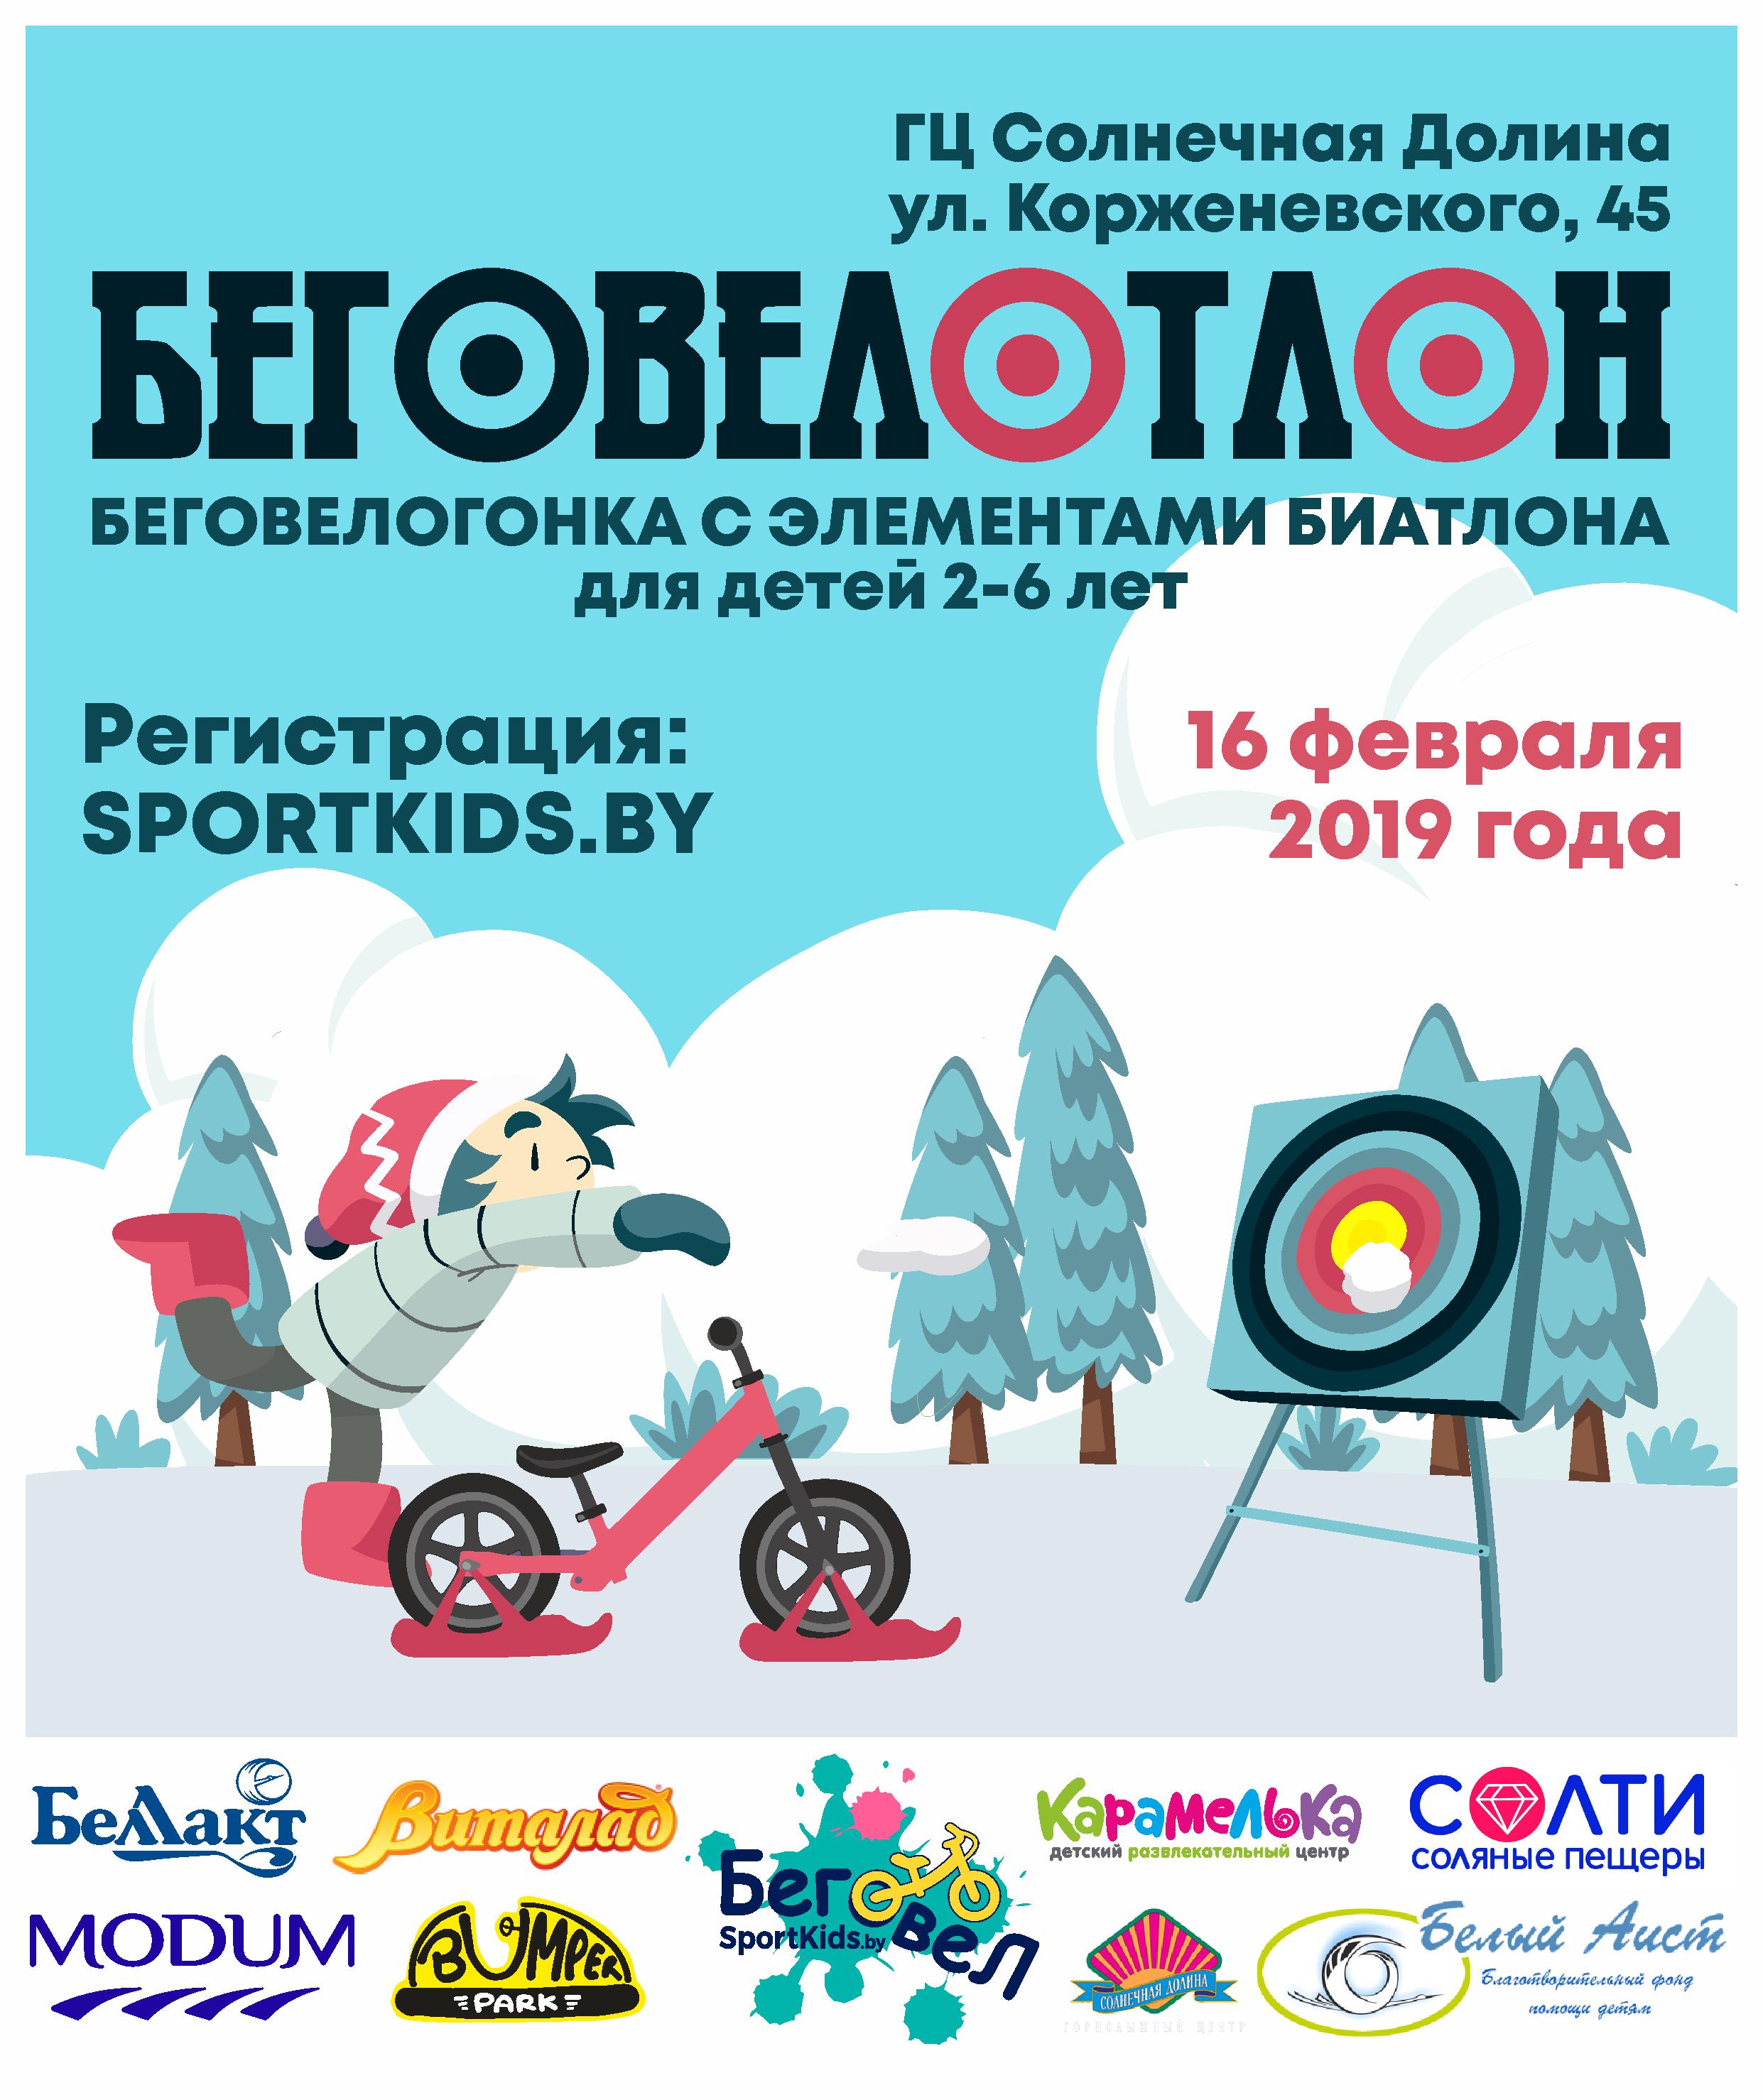 Беговелотлон - беговелогонка с лыжами и элементами биатлона от sportkids.by